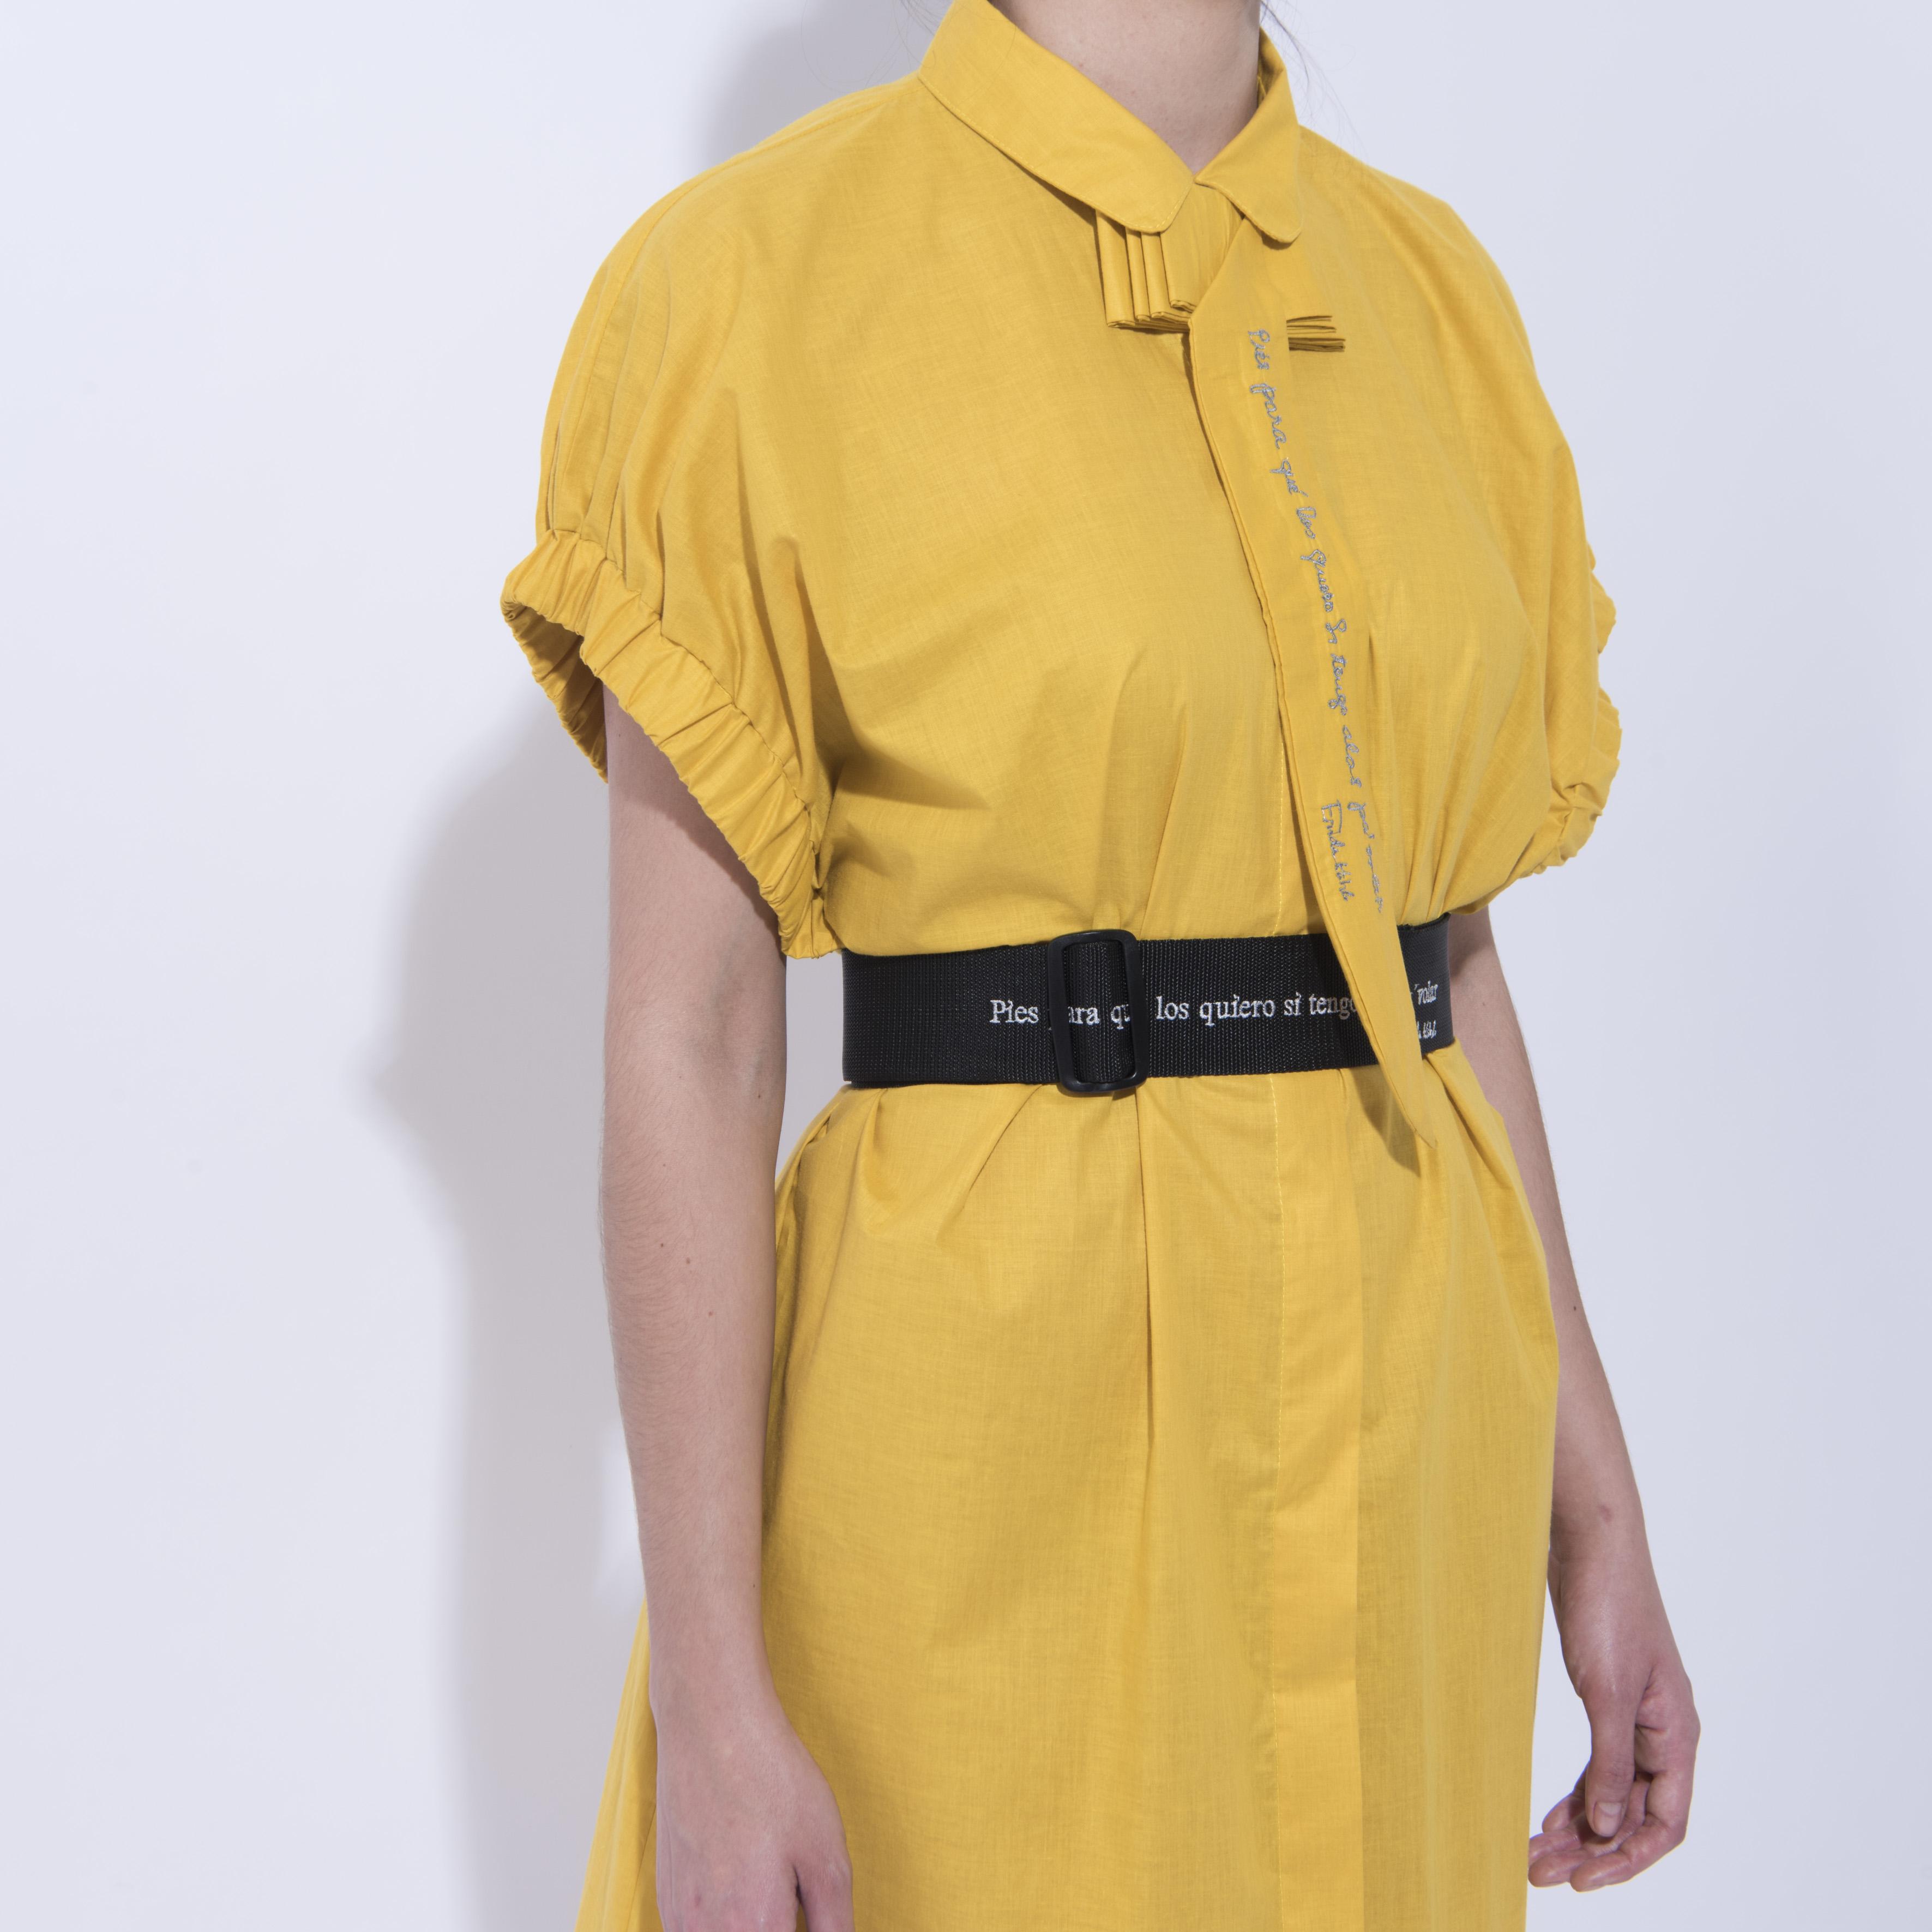 Camisola FRIDA - color mostaza